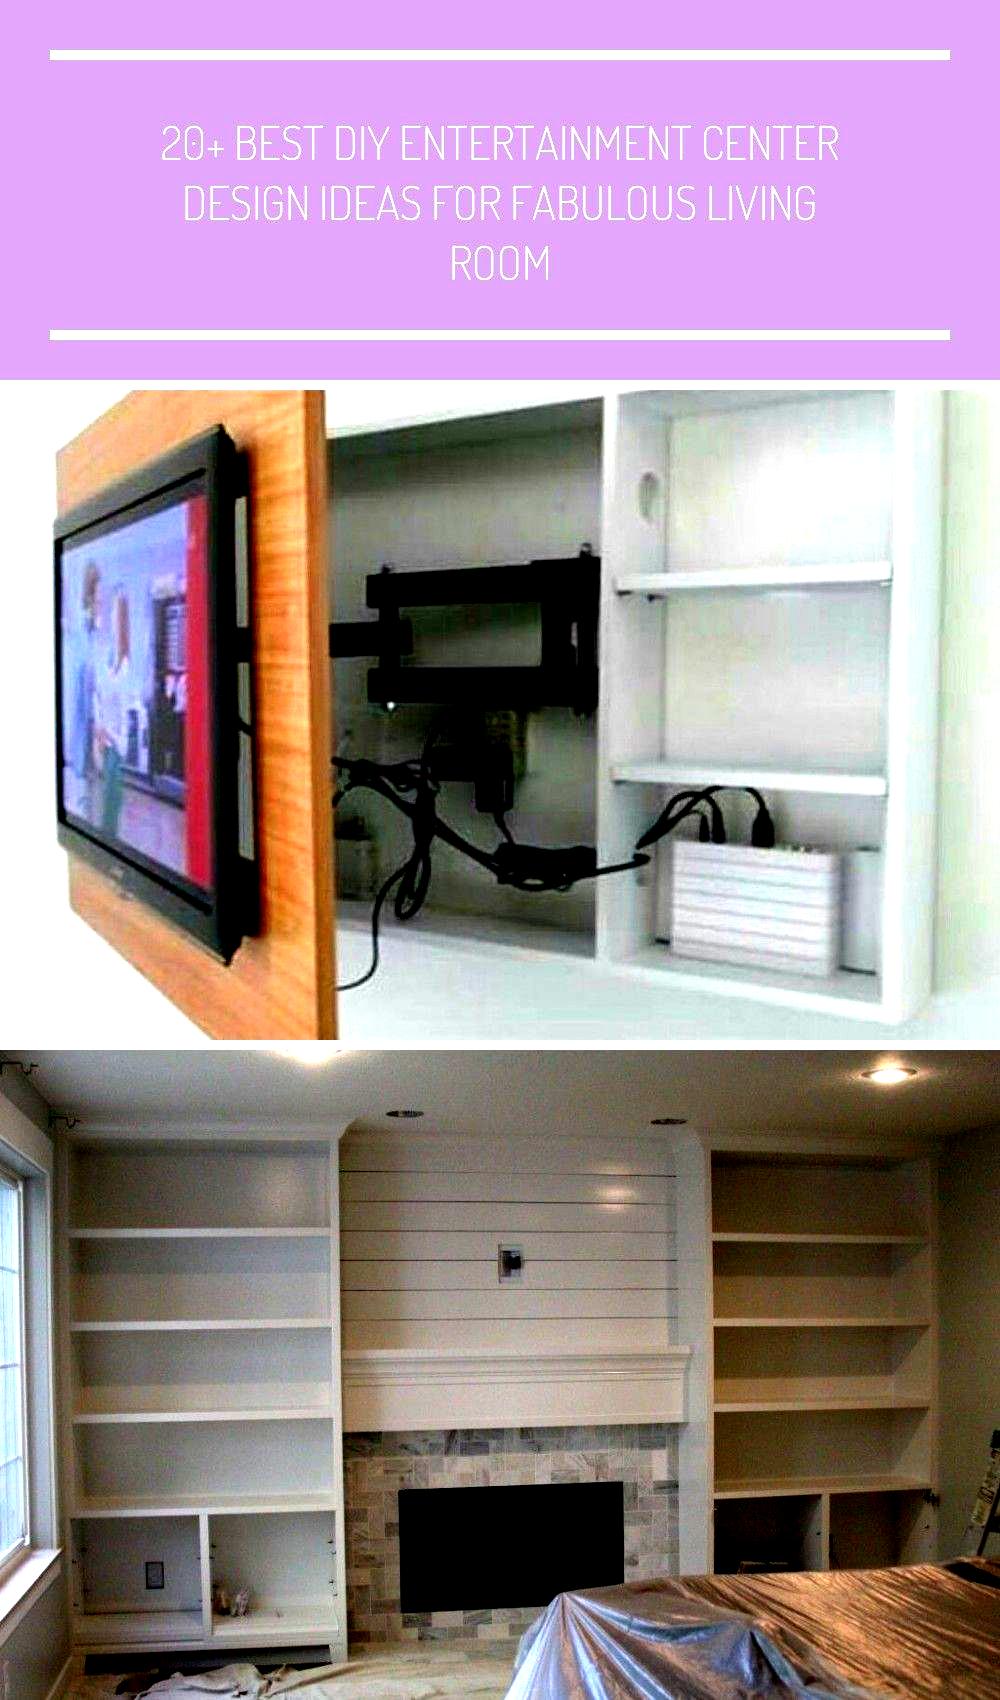 More ideas below: #HomeDecorIdeas #DiyHomeDecor DIY Pallet Enterta… | Pallet entertainment centers, Fireplace entertainment center, Living room entertainment center